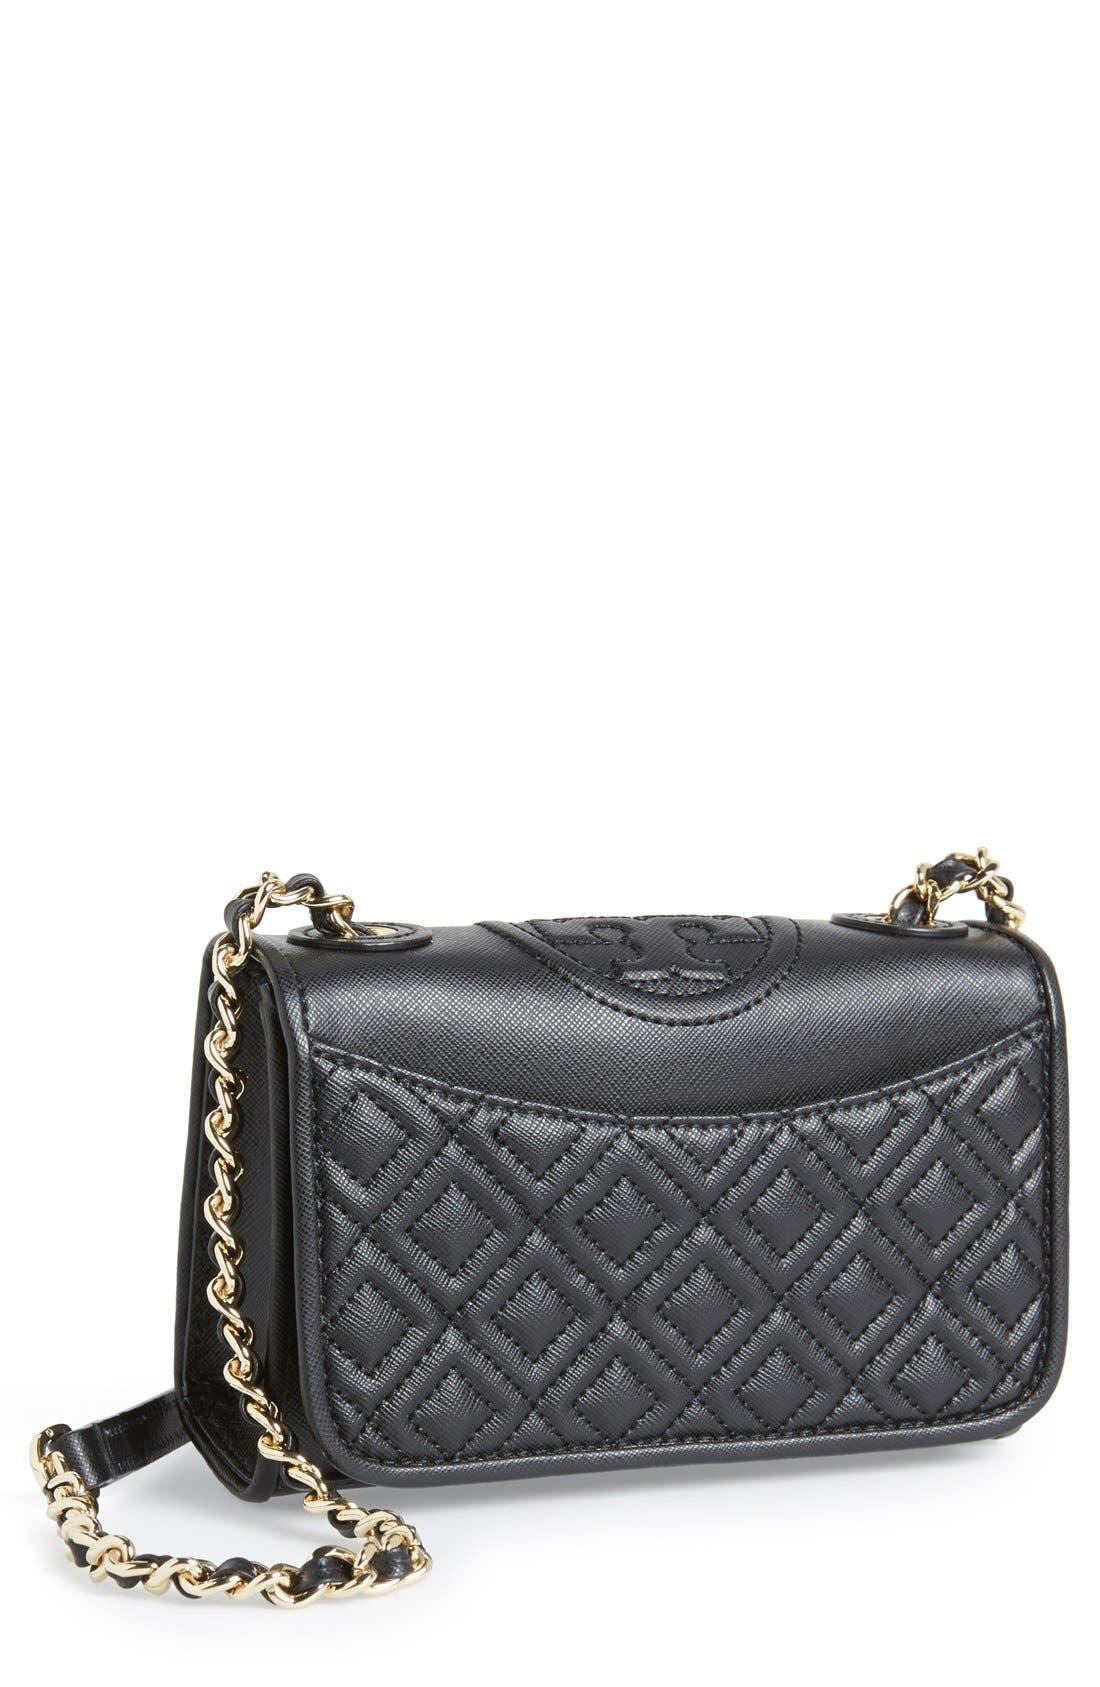 'Mini Fleming' Saffiano Leather Shoulder Bag,                             Main thumbnail 1, color,                             001